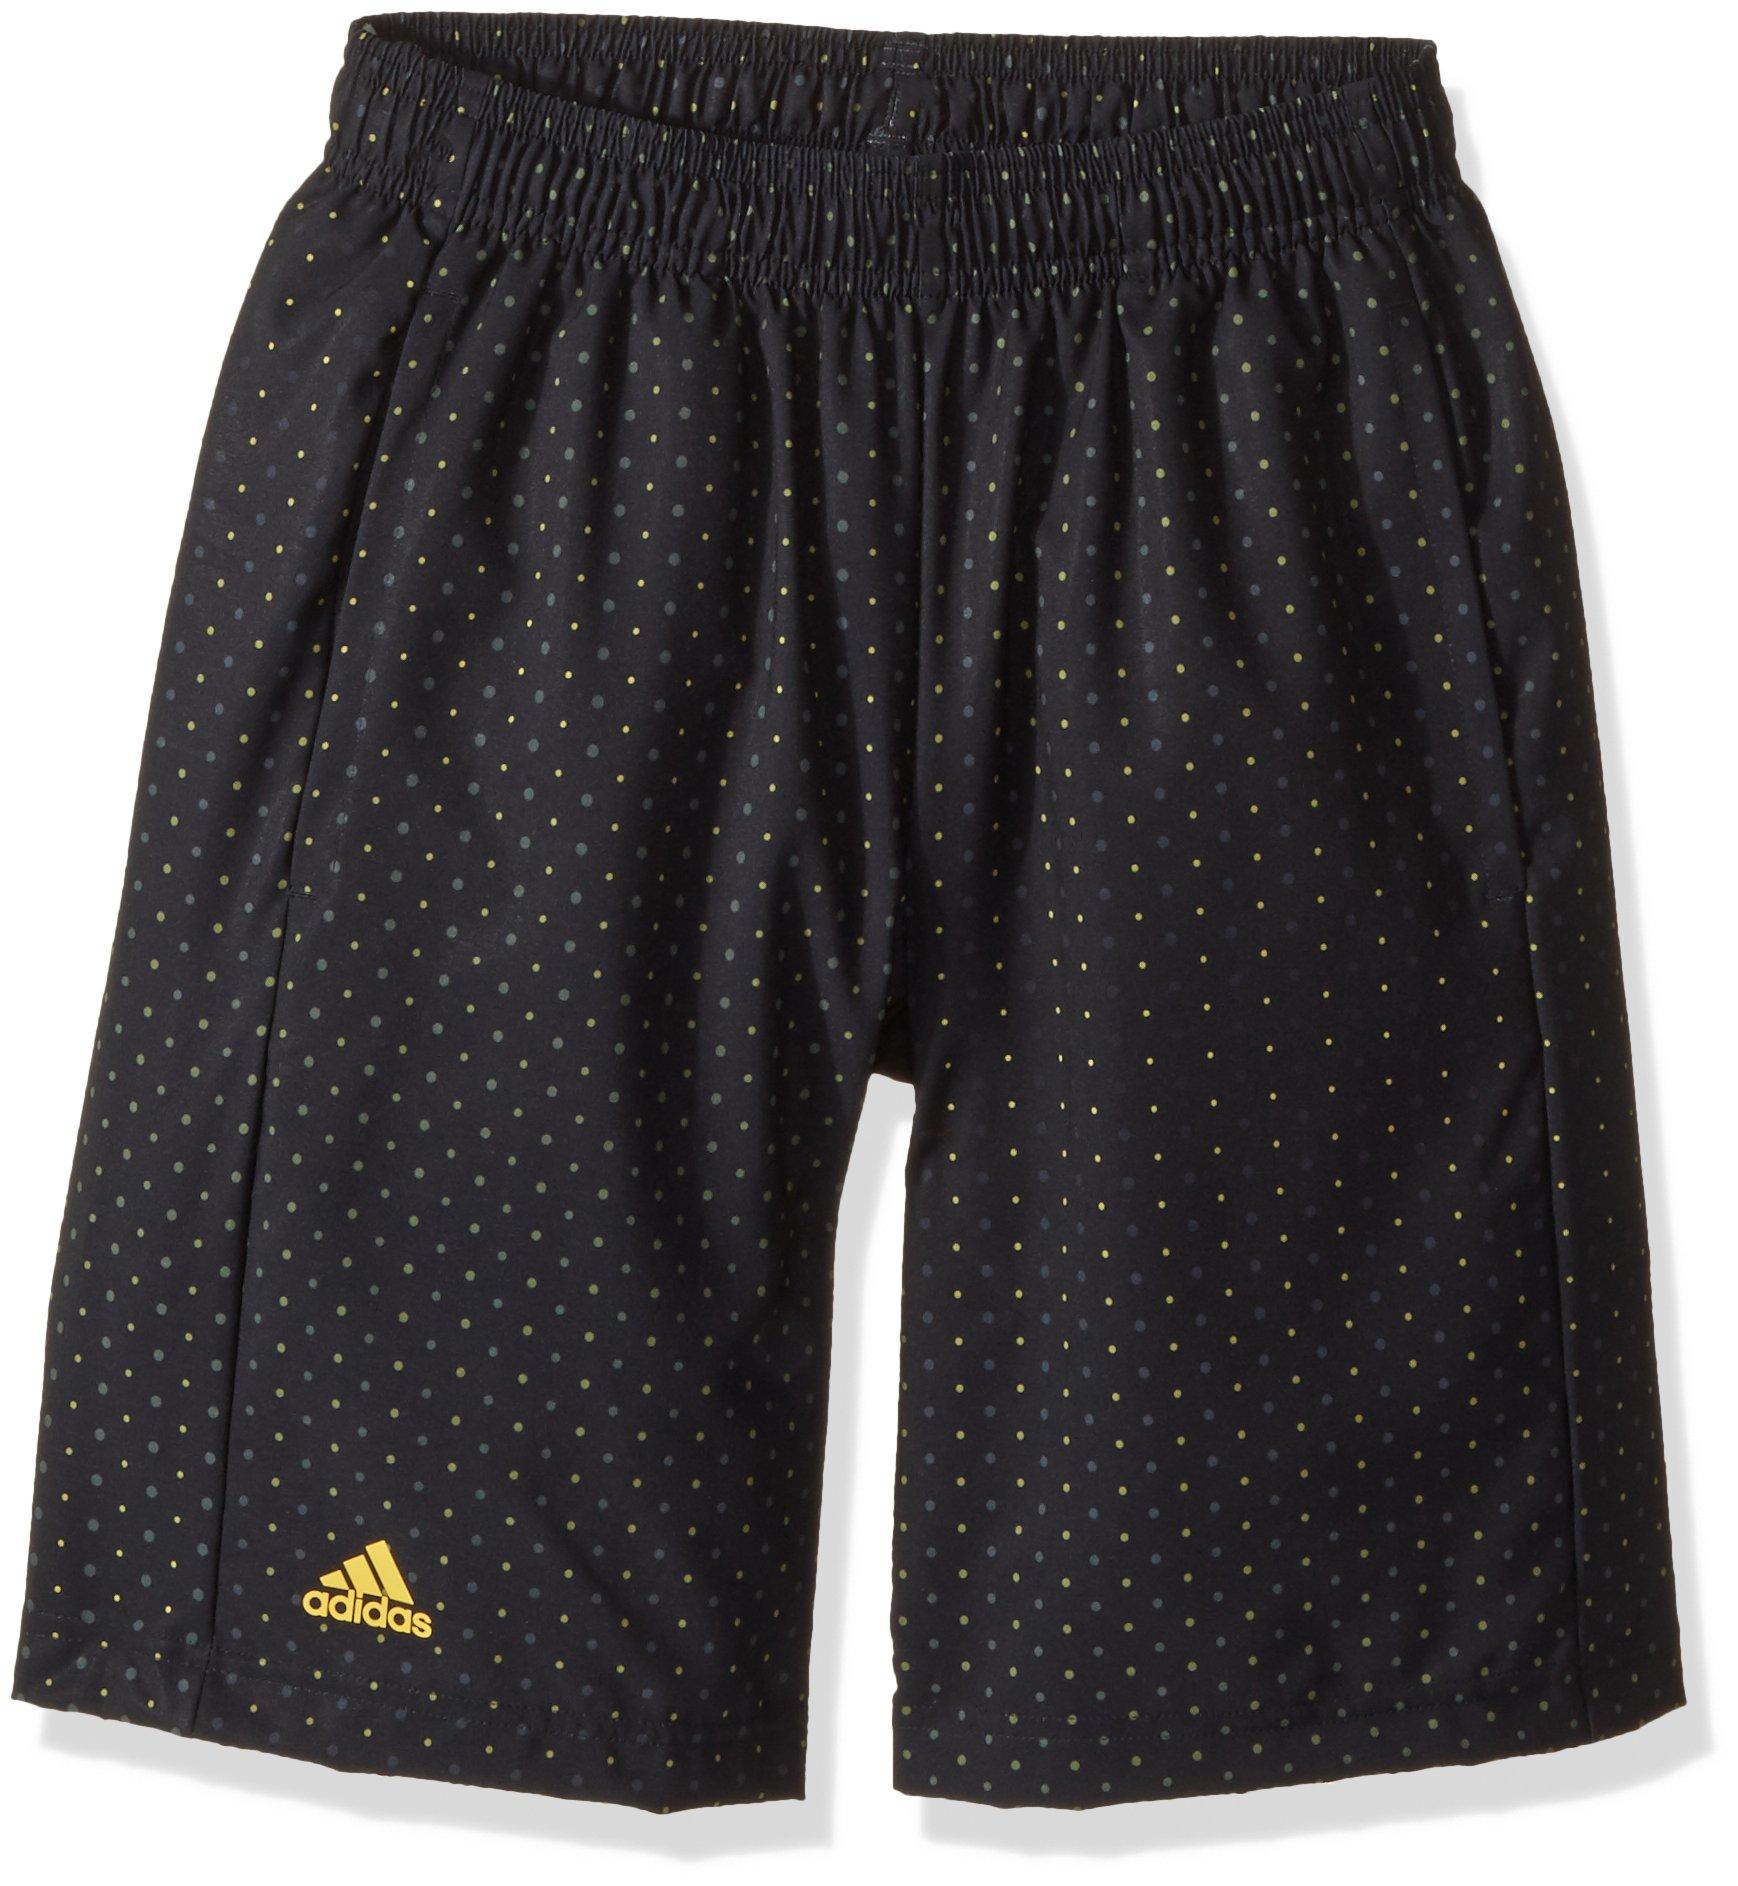 adidas Youth Boys Tennis Advantage Bermuda Shorts, Black, X-Small